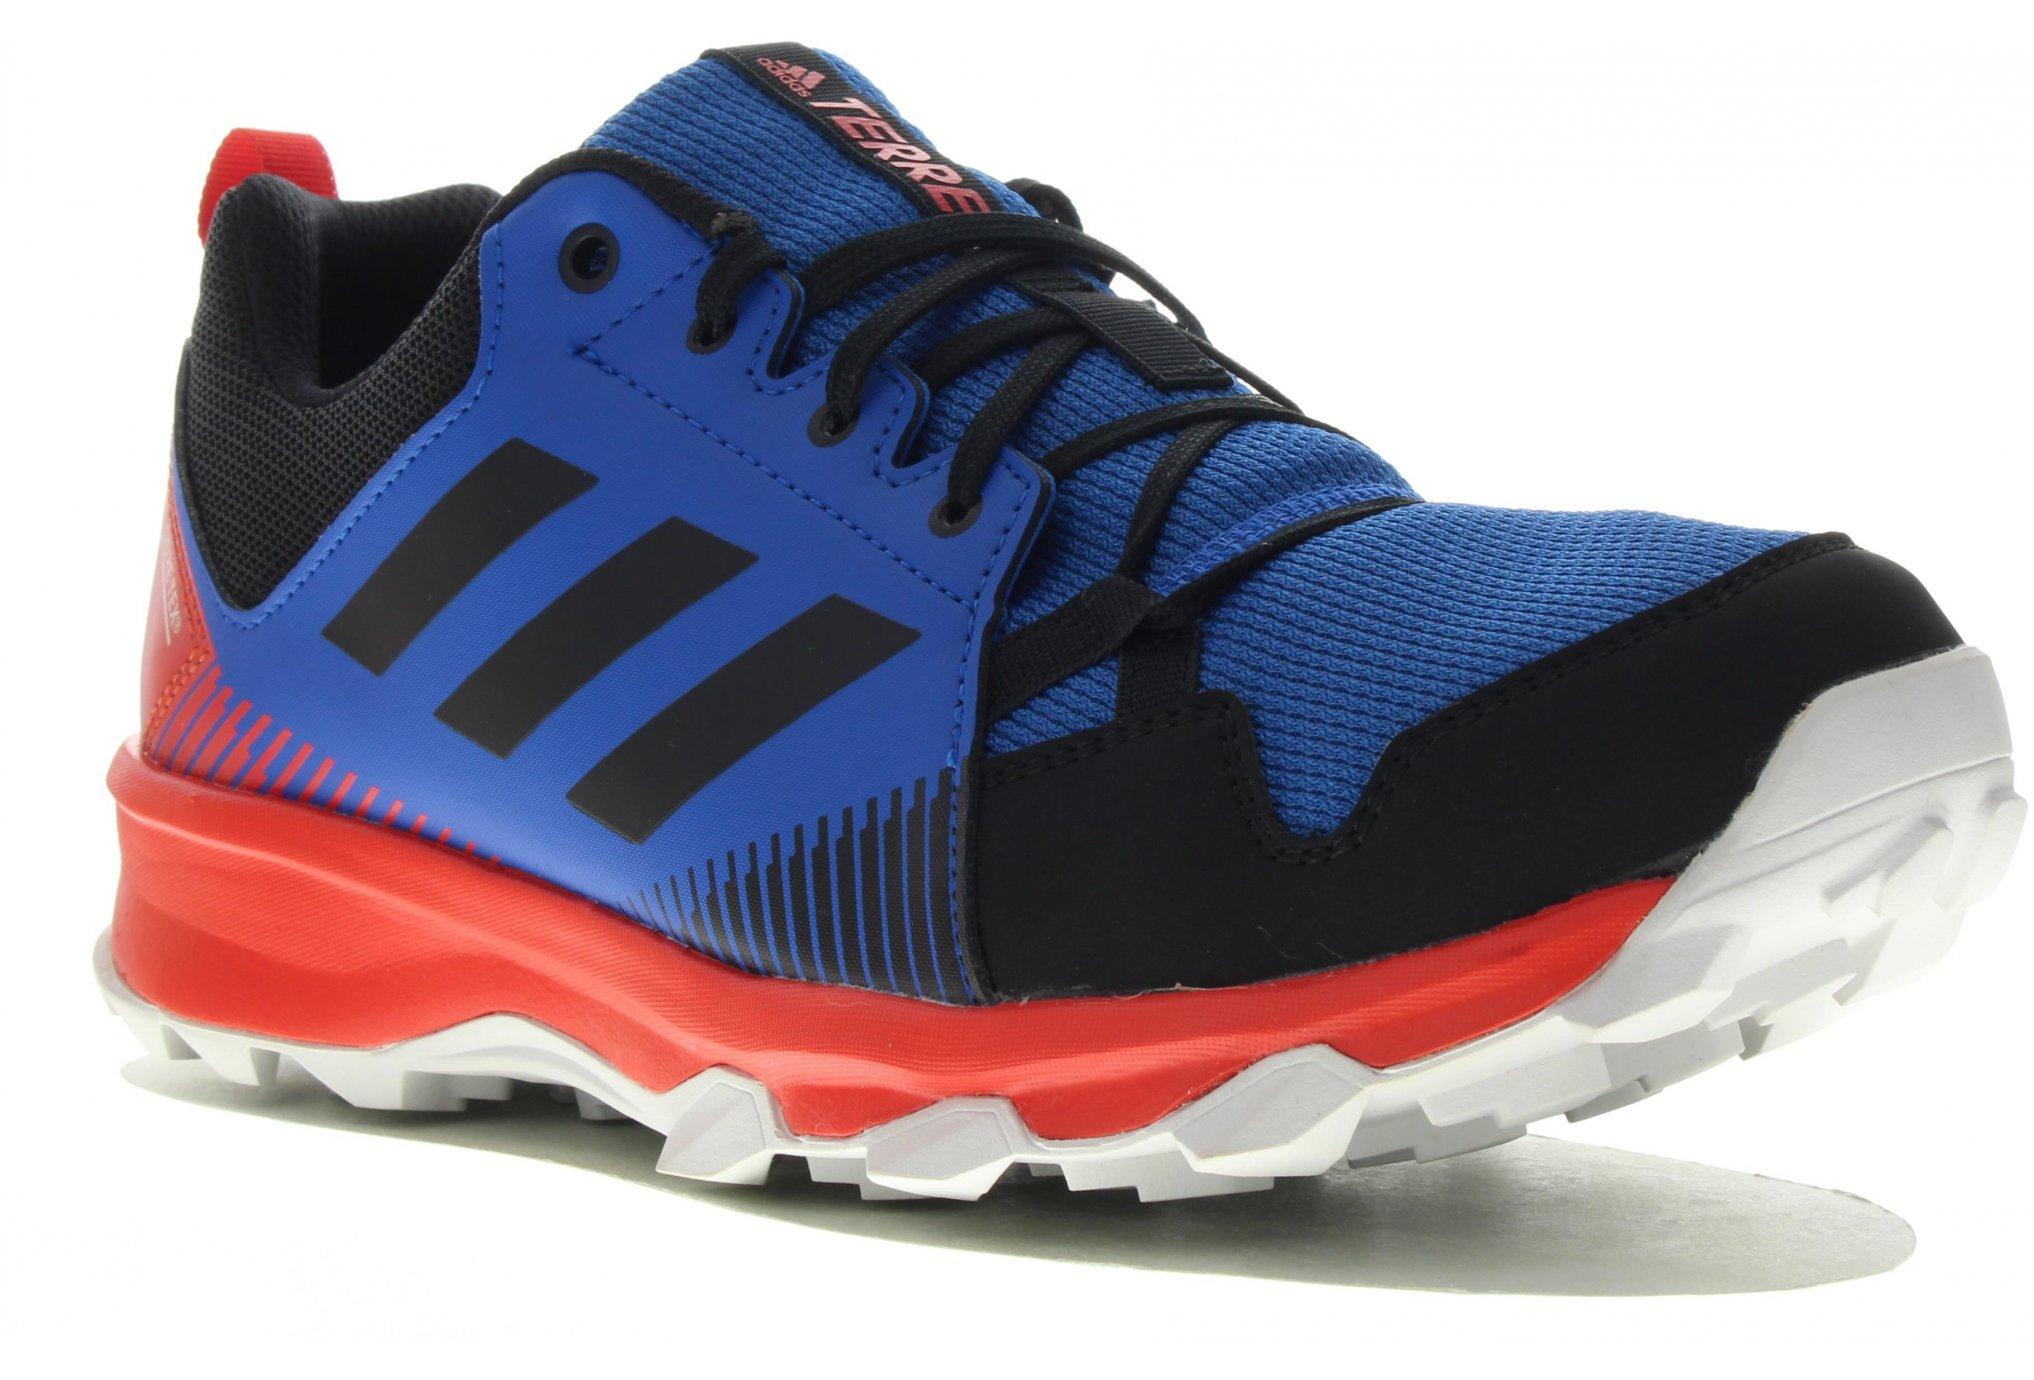 Chaussures Adidas Terrex Tracerocker Gore-Tex - Tailles 40 au 45